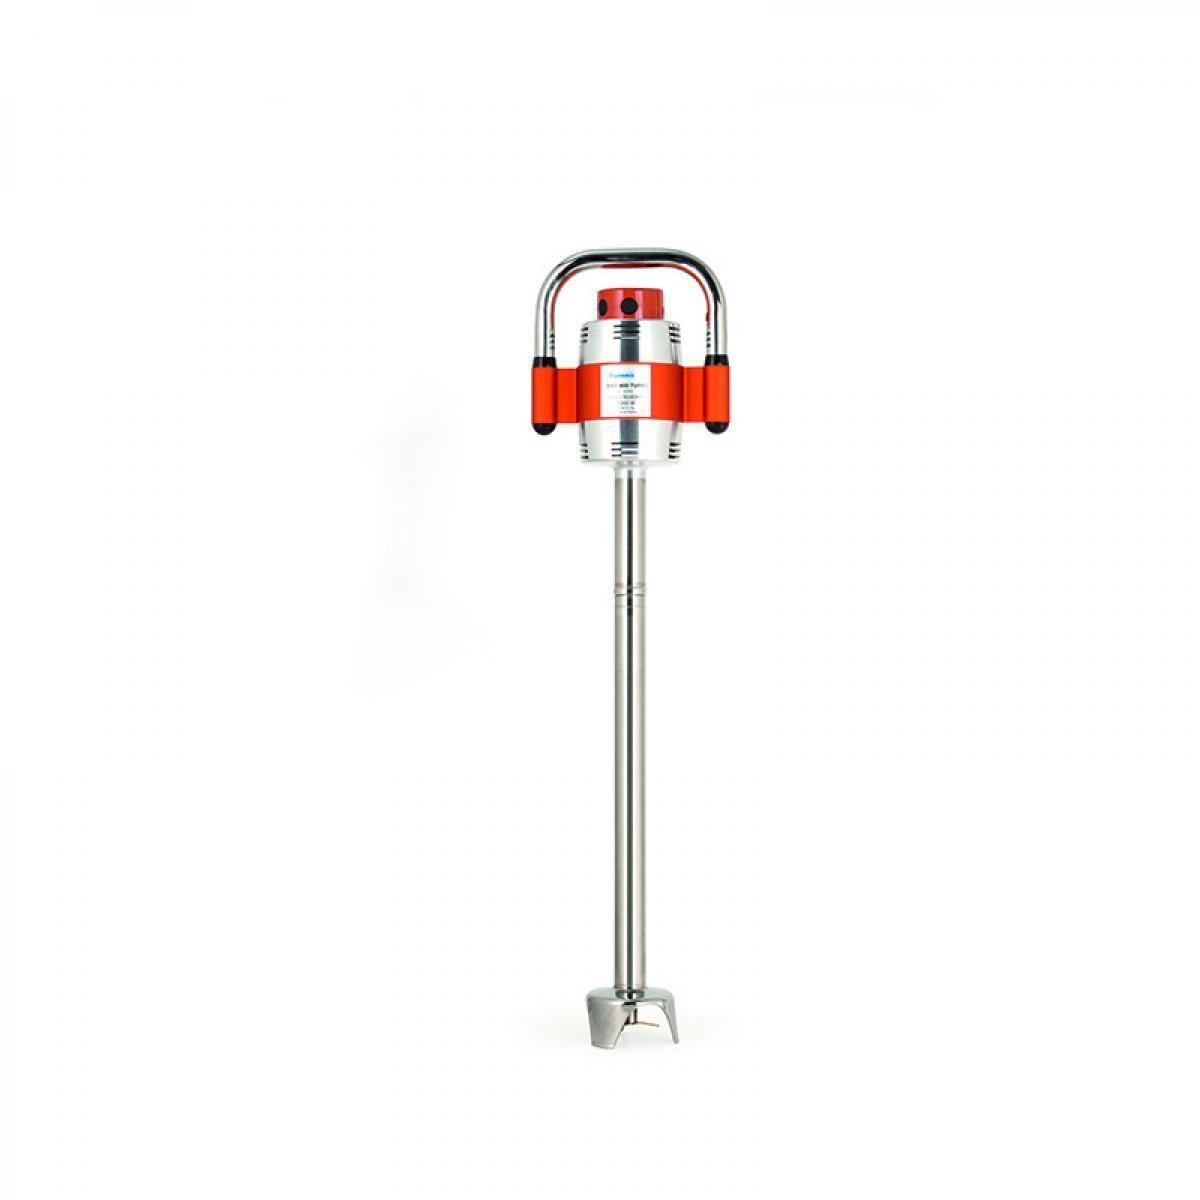 Dynamic Mixeur Plongeant Professionnel Gamme SMX 800 Turbo - Dynamic - 12,5 cm